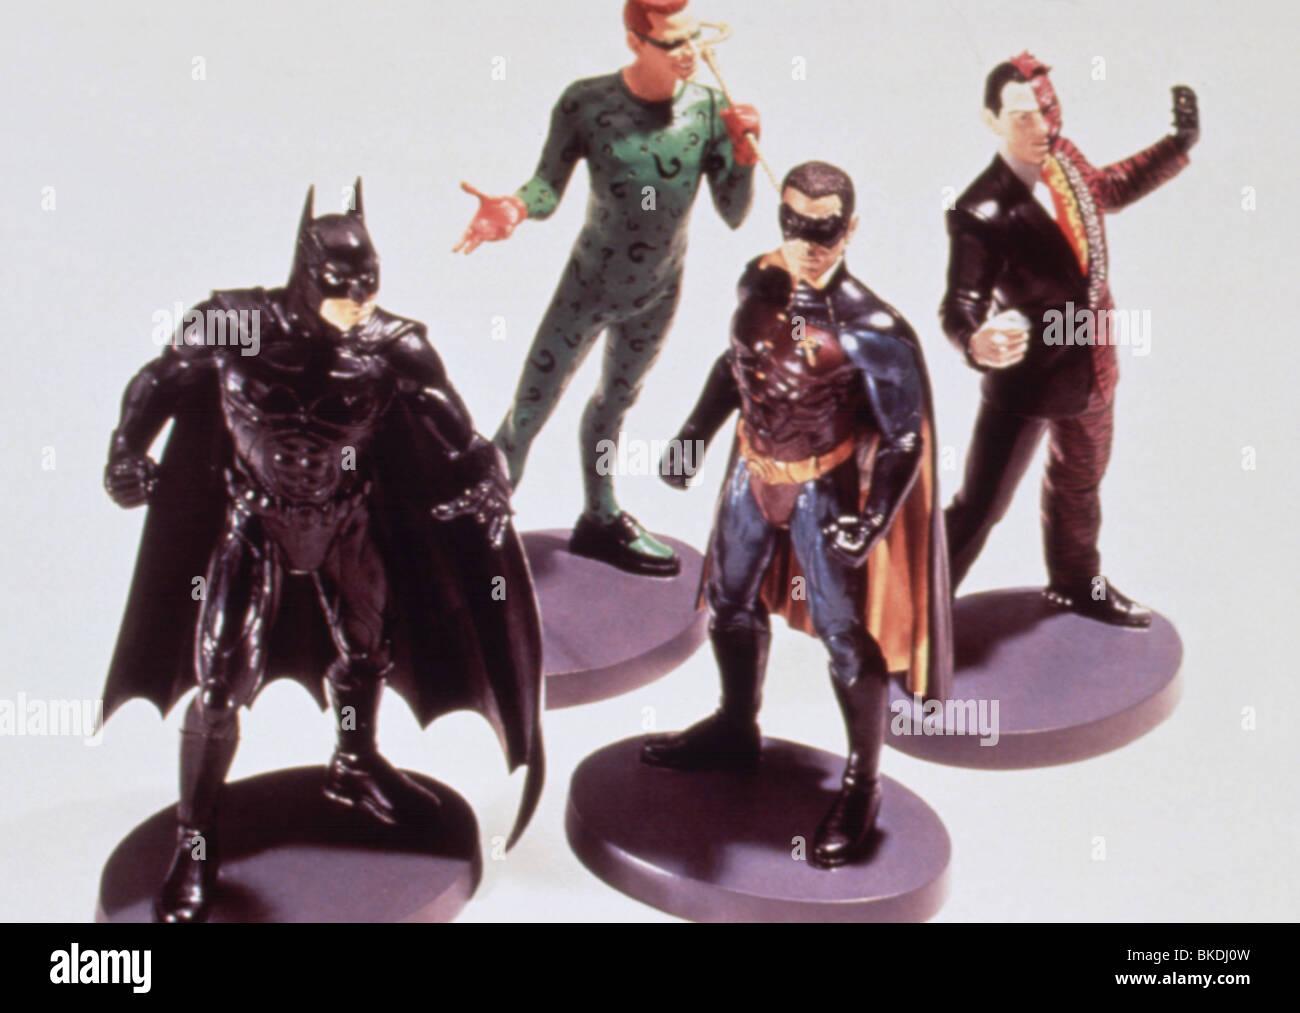 BATMAN FOREVER (1995) MERCHANDISE FIGURINES MERH 003 - Stock Image